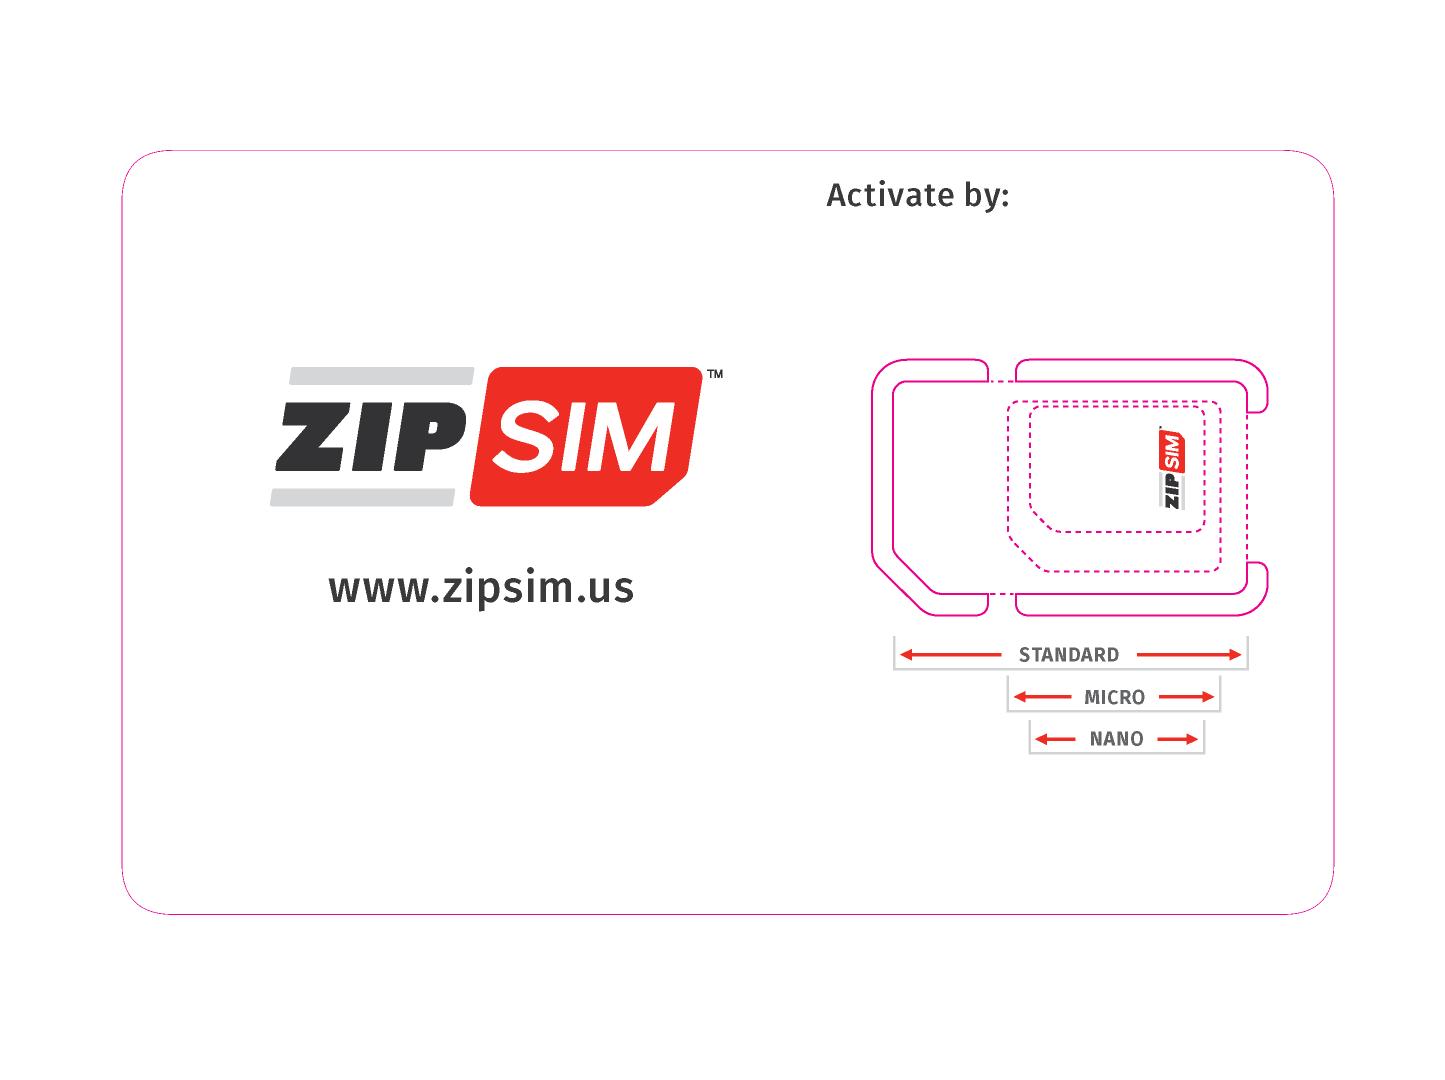 ZIP SIM sim card sizes